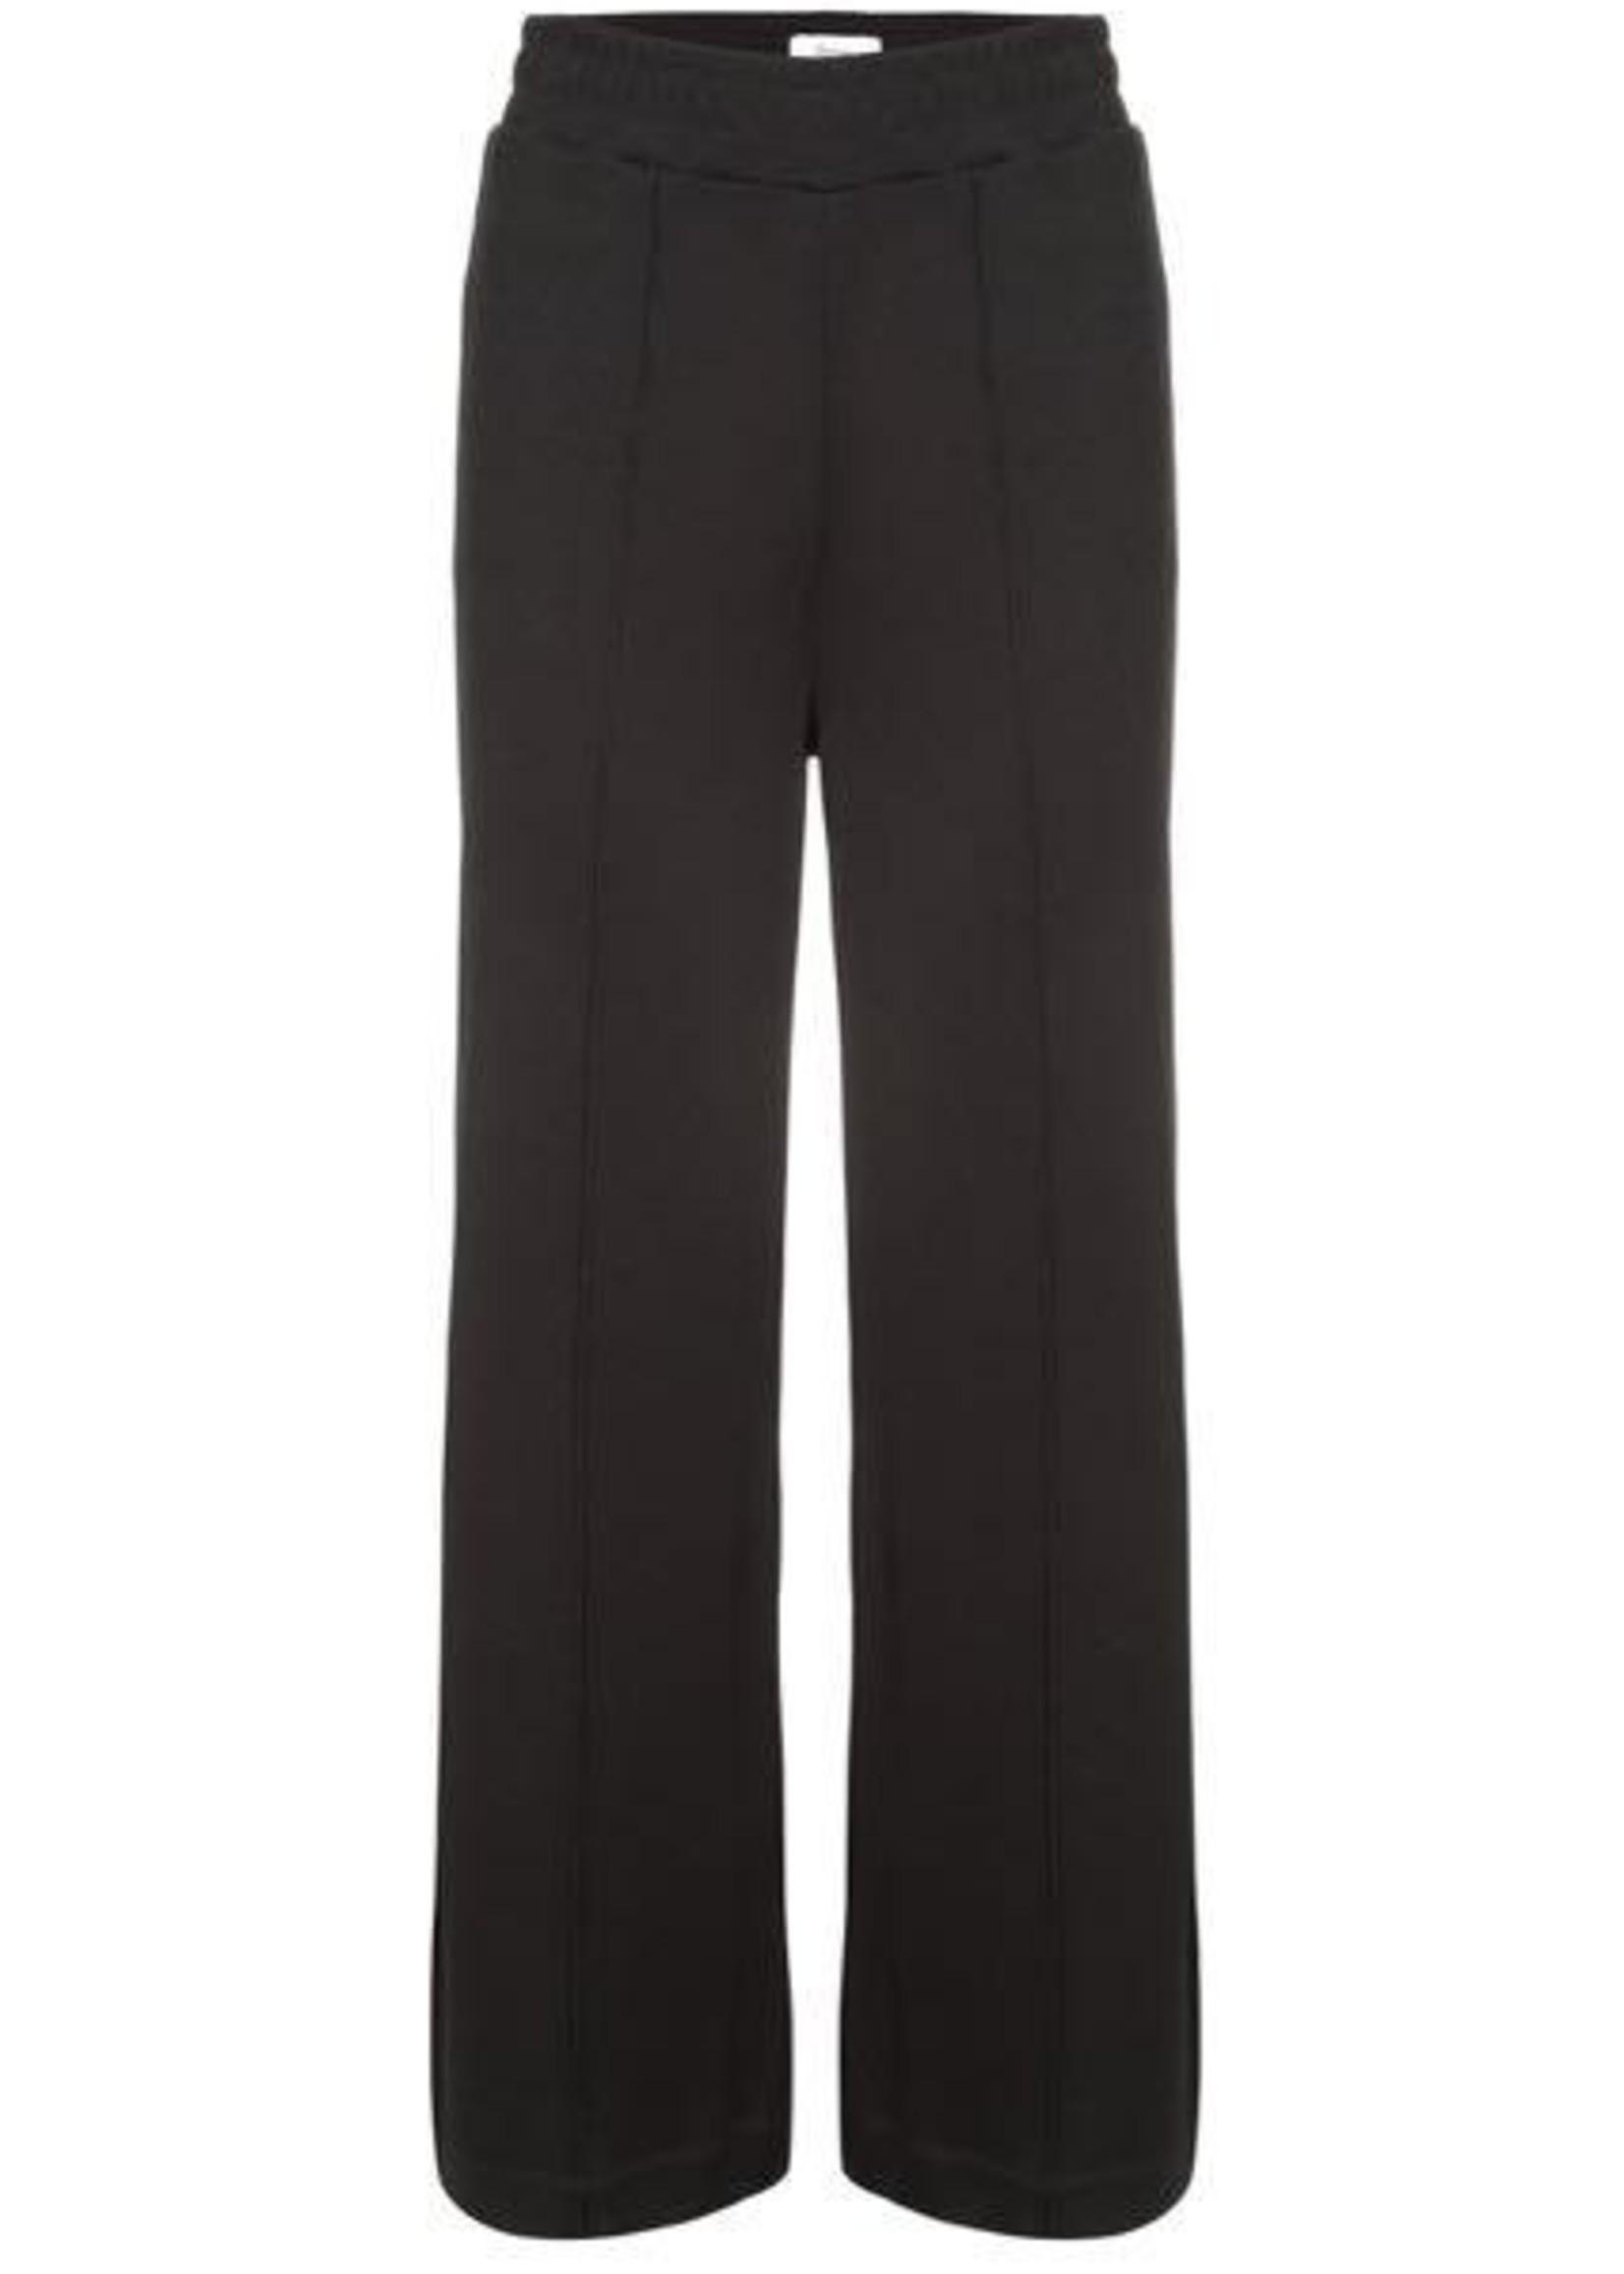 Ame ame antwerp dash pants viscose black